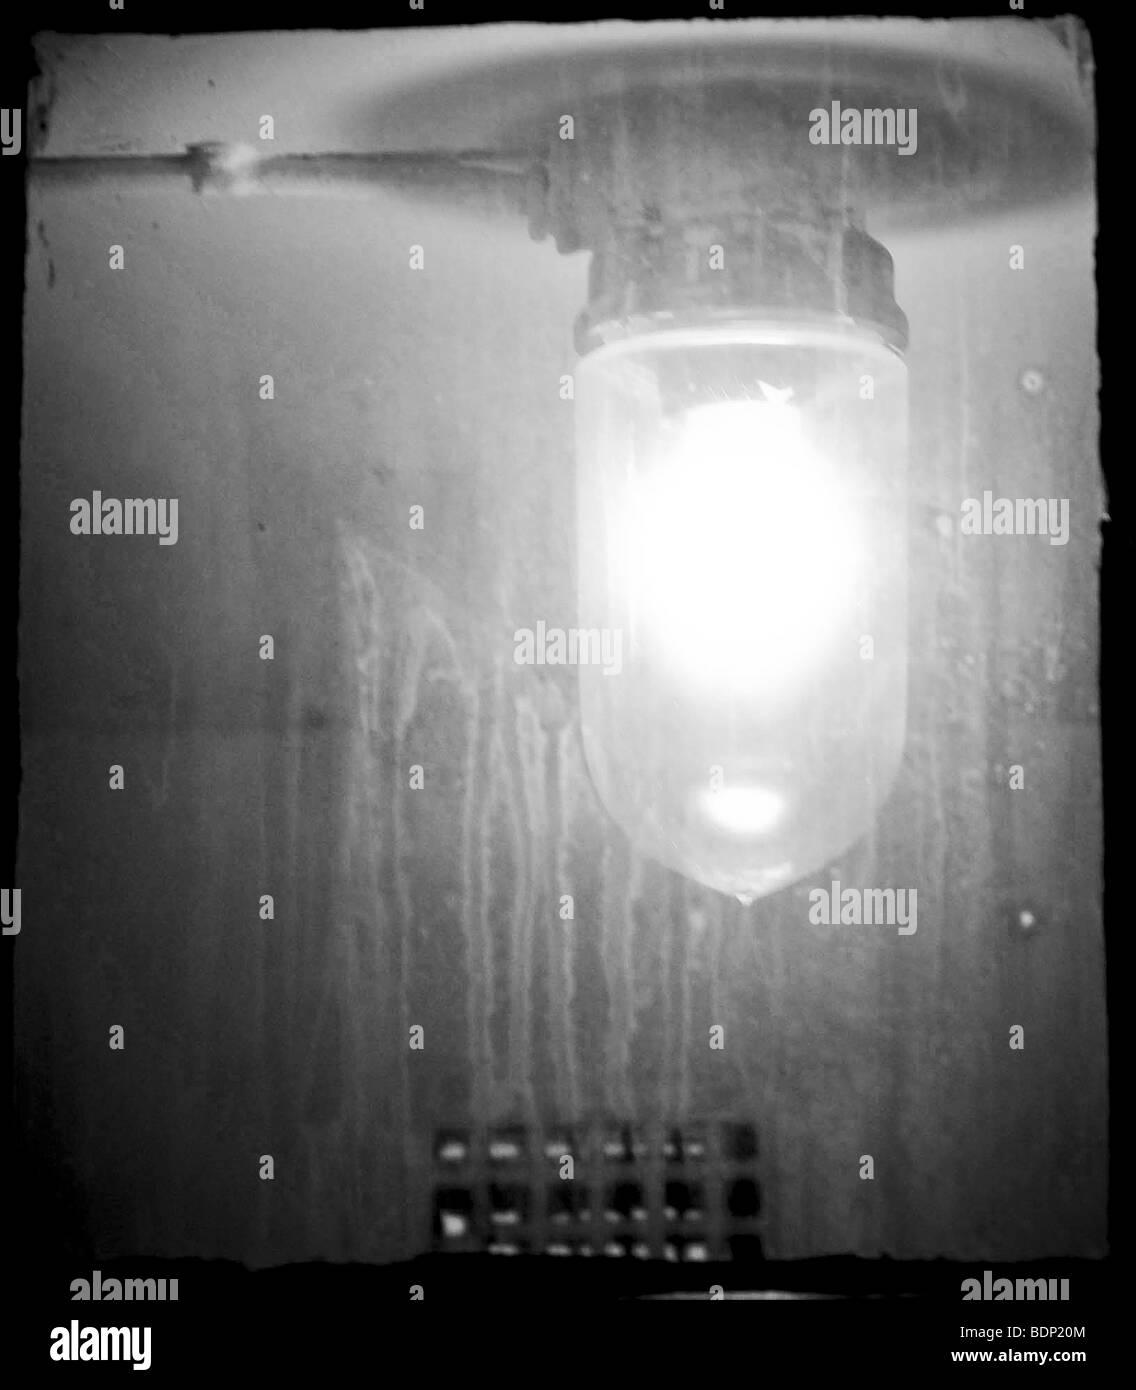 An illuminated electric light - Stock Image